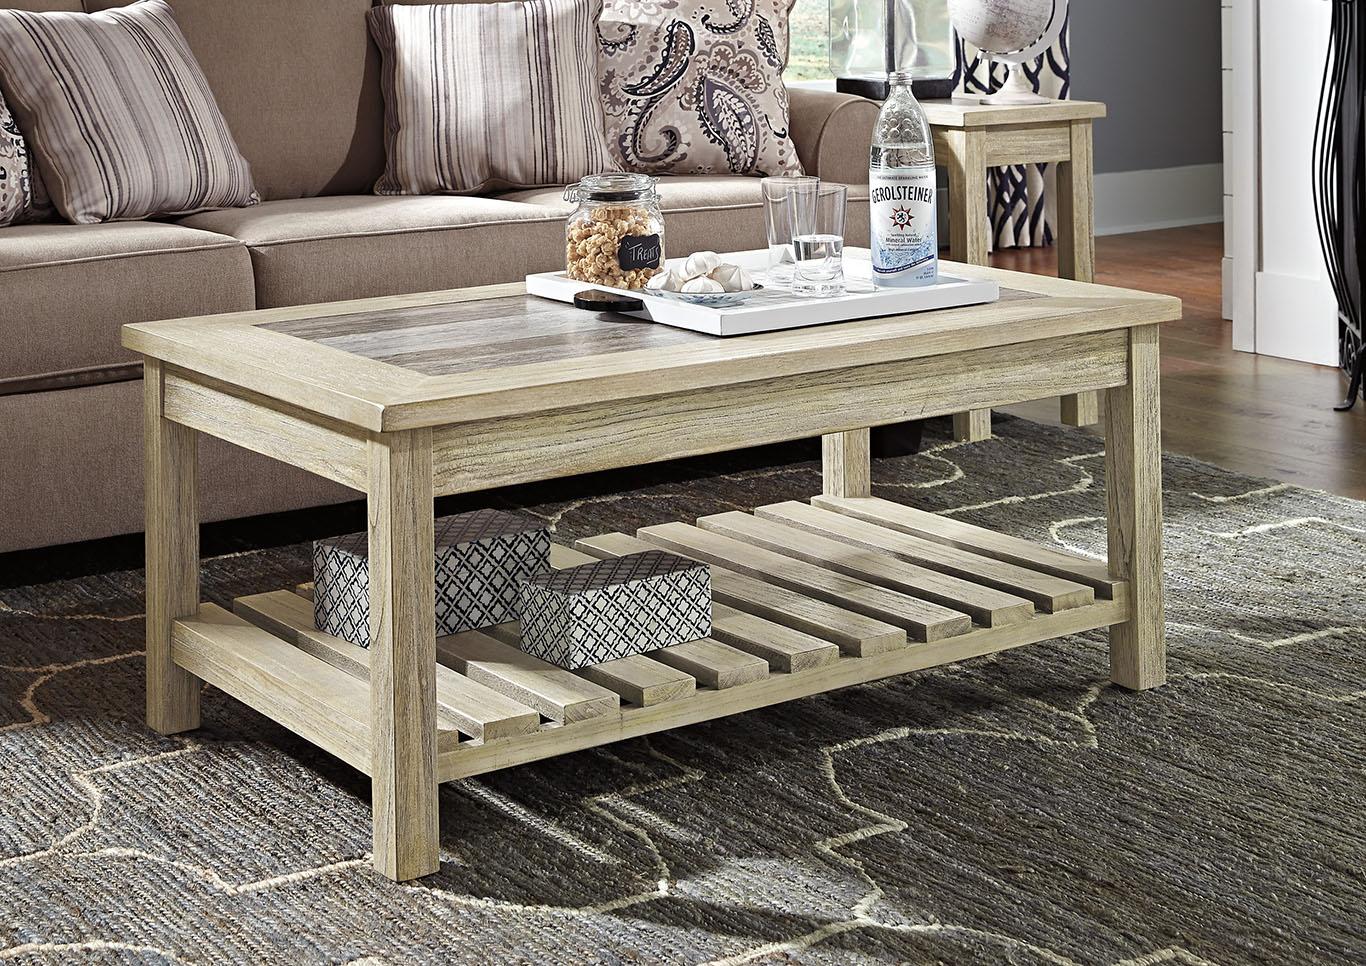 Price Point Furniture Veldar Whitewash Rectangular